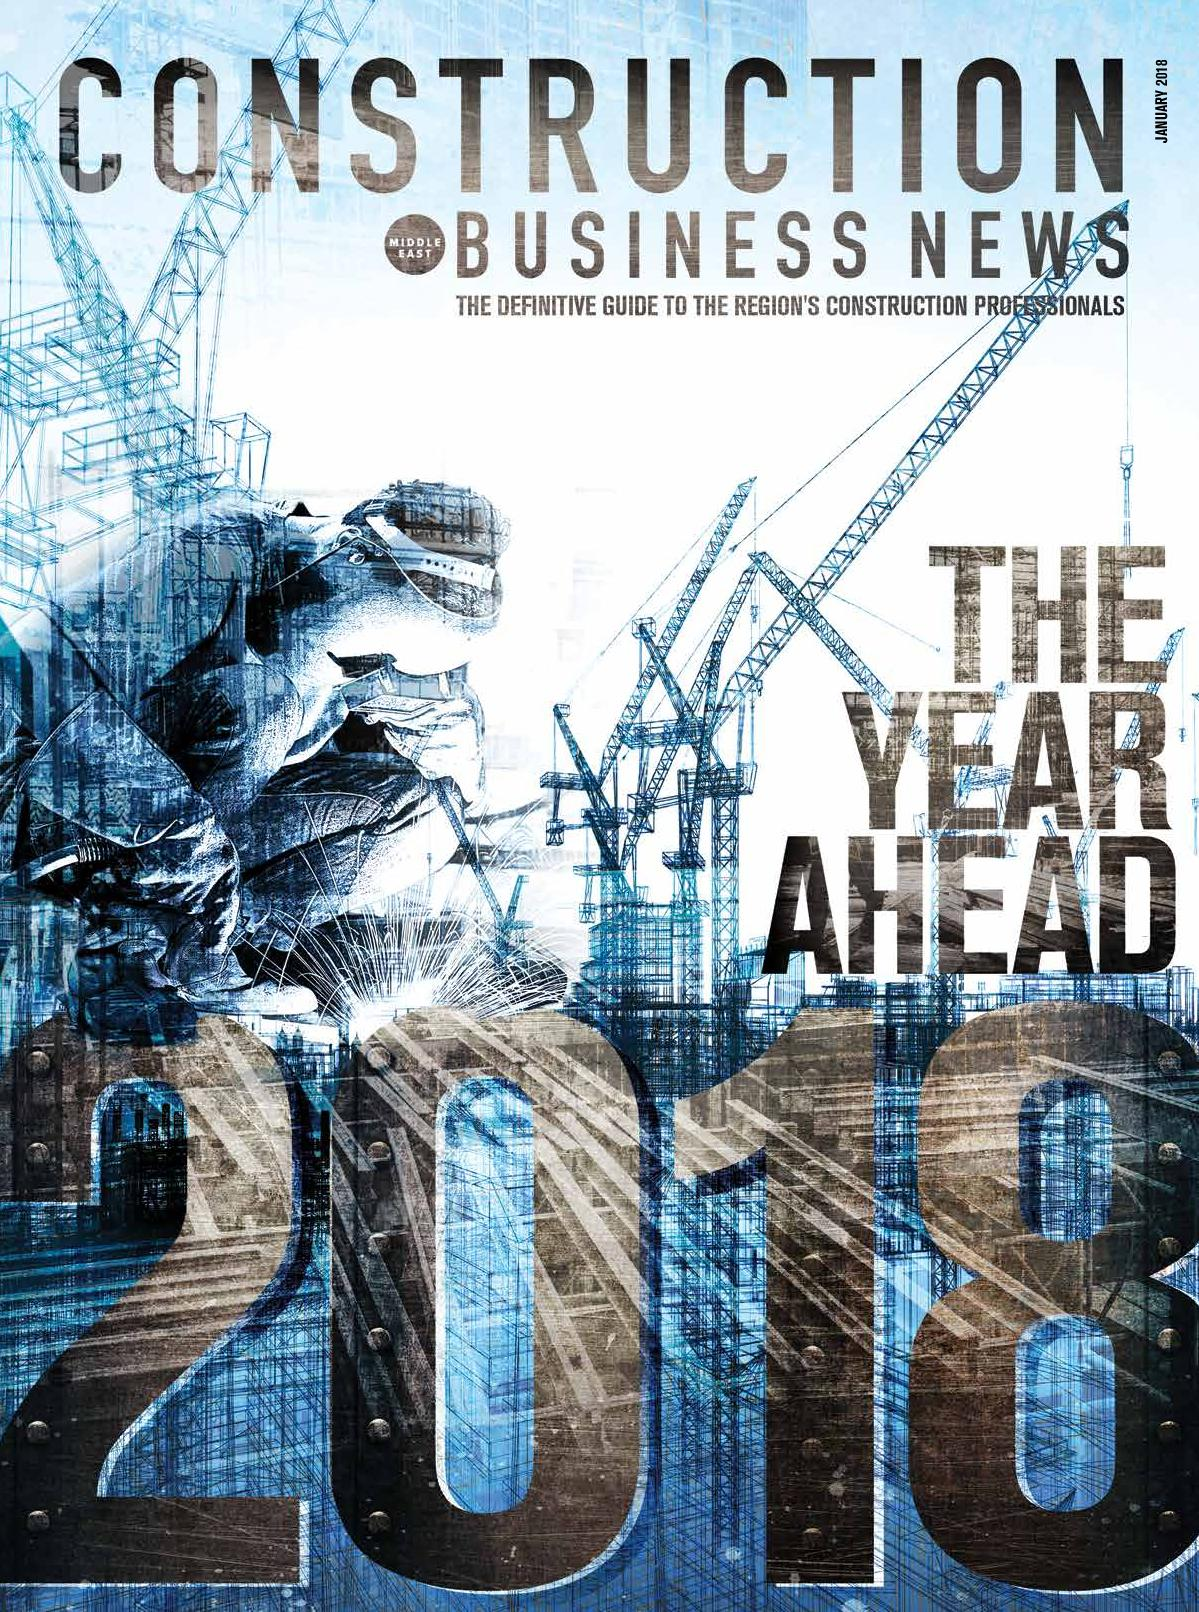 http://www.cbnme.com/magazines/construction-business-news-january-2018/